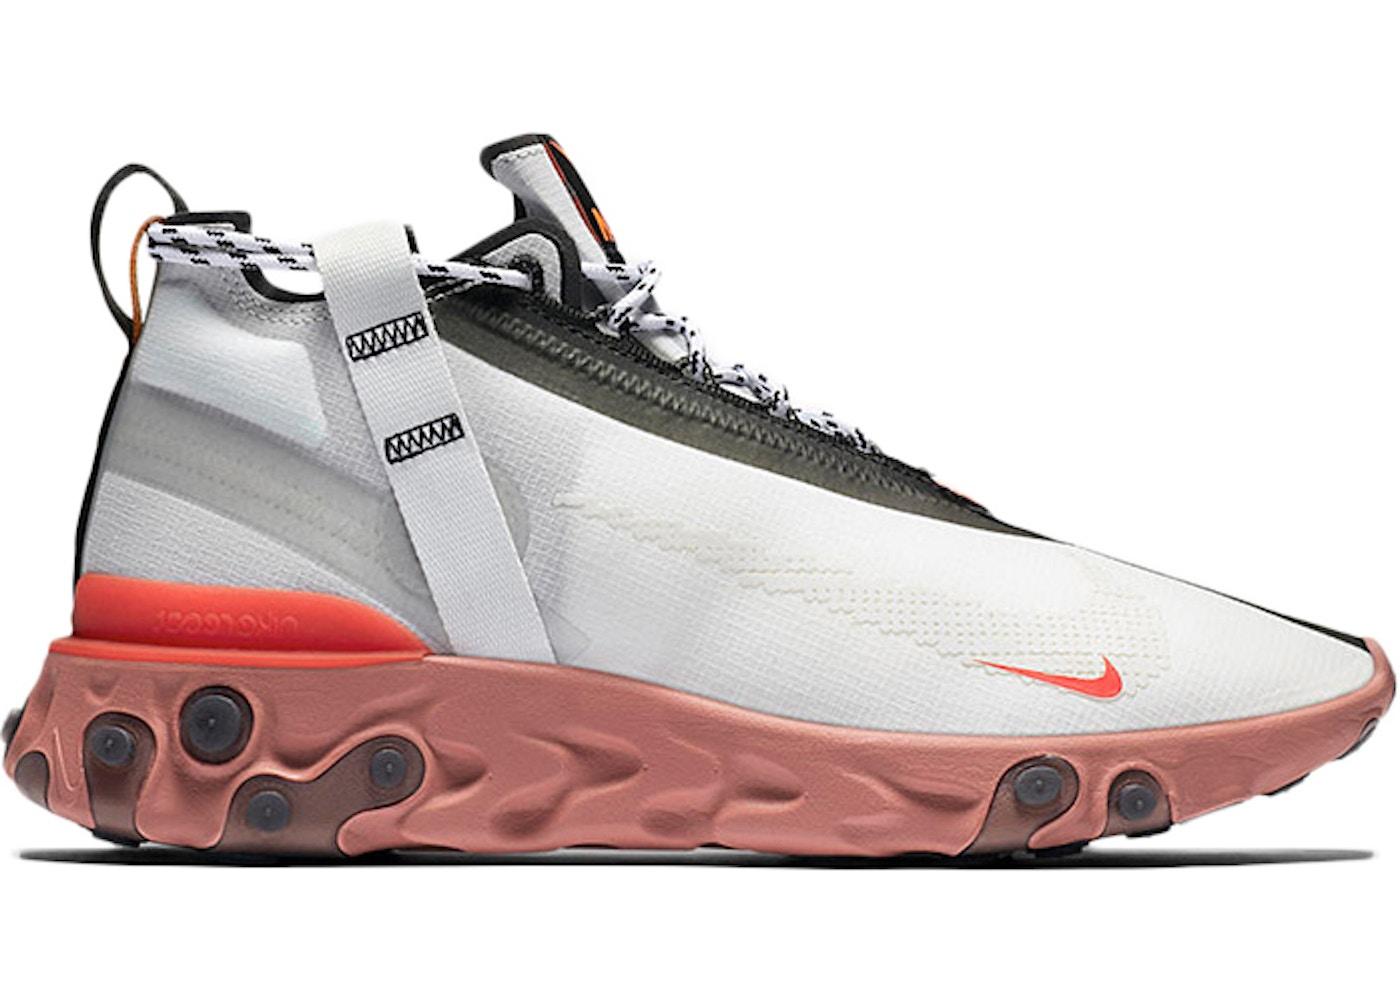 Secreto juicio Presunción  Nike React Runner Mid WR ISPA White Light Crimson - AT3143-100